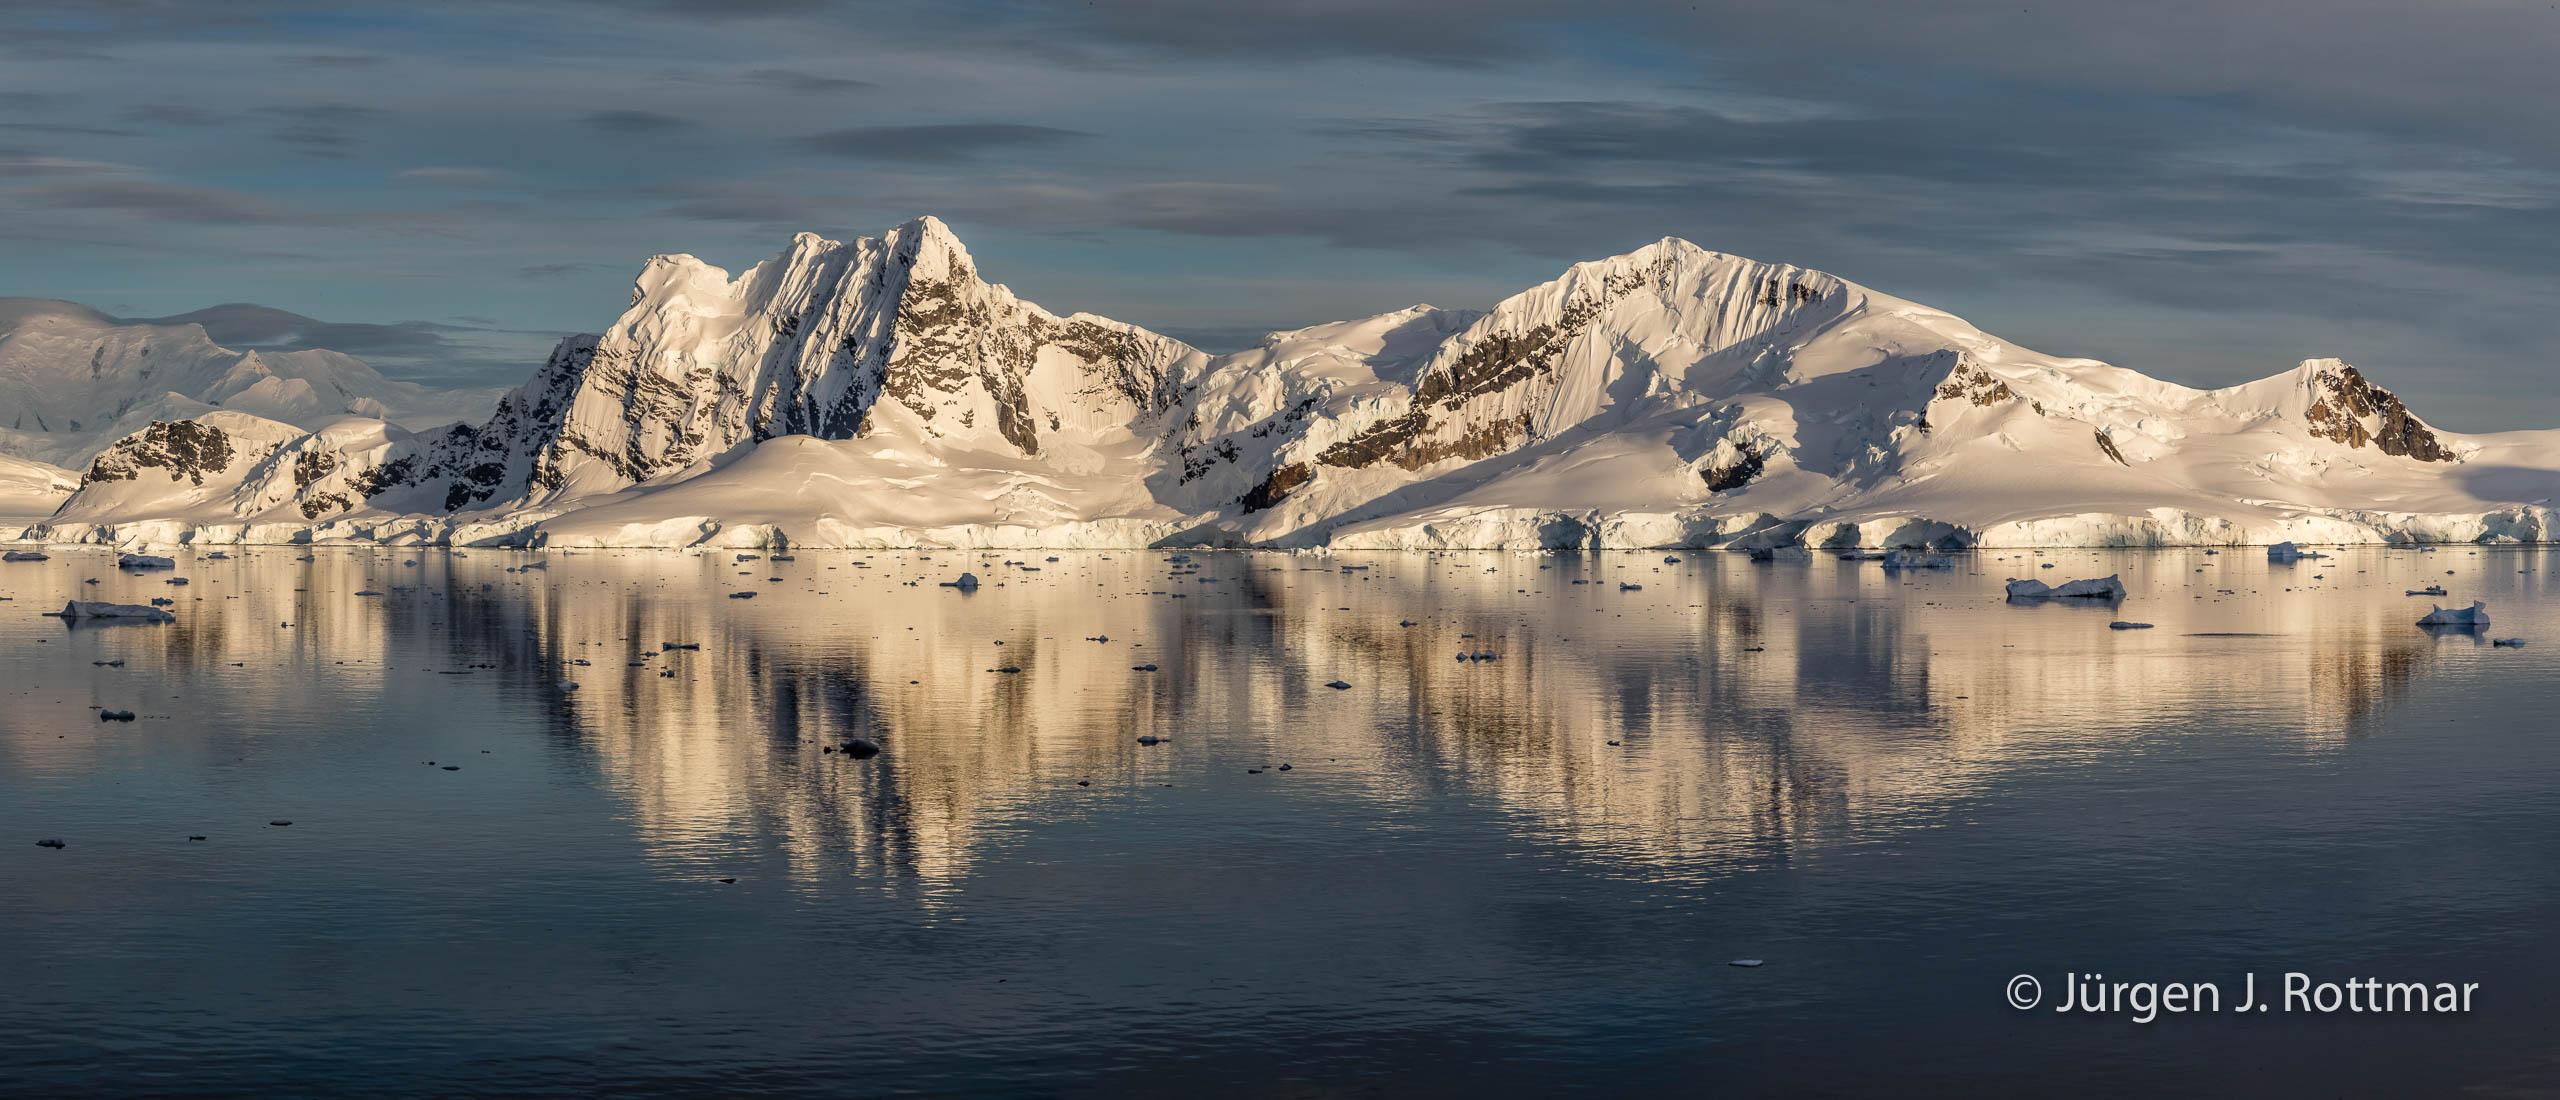 Juergen J Rottmar Antarctic Peninsula M2I1246 Pano Bearbeitet